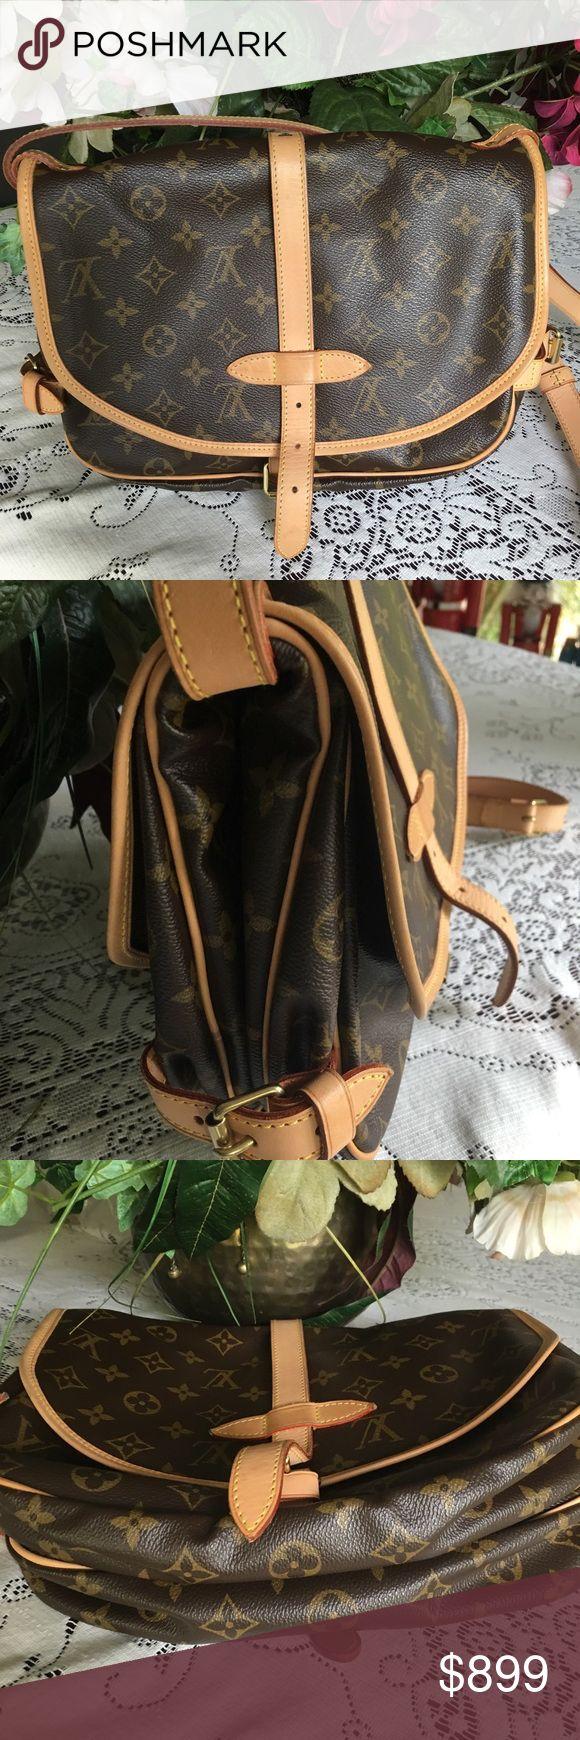 "Authentic Louis Vuitton Bag Authentic Louis Vuitton MonogramSaumur GM M40662 Shoulder Bag . Overall in very good condition. Size : H 7.87 W 11.81 D 3.93 "" Strap length : 42.91-49.99"" smoke fee Louis Vuitton Bags Shoulder Bags"